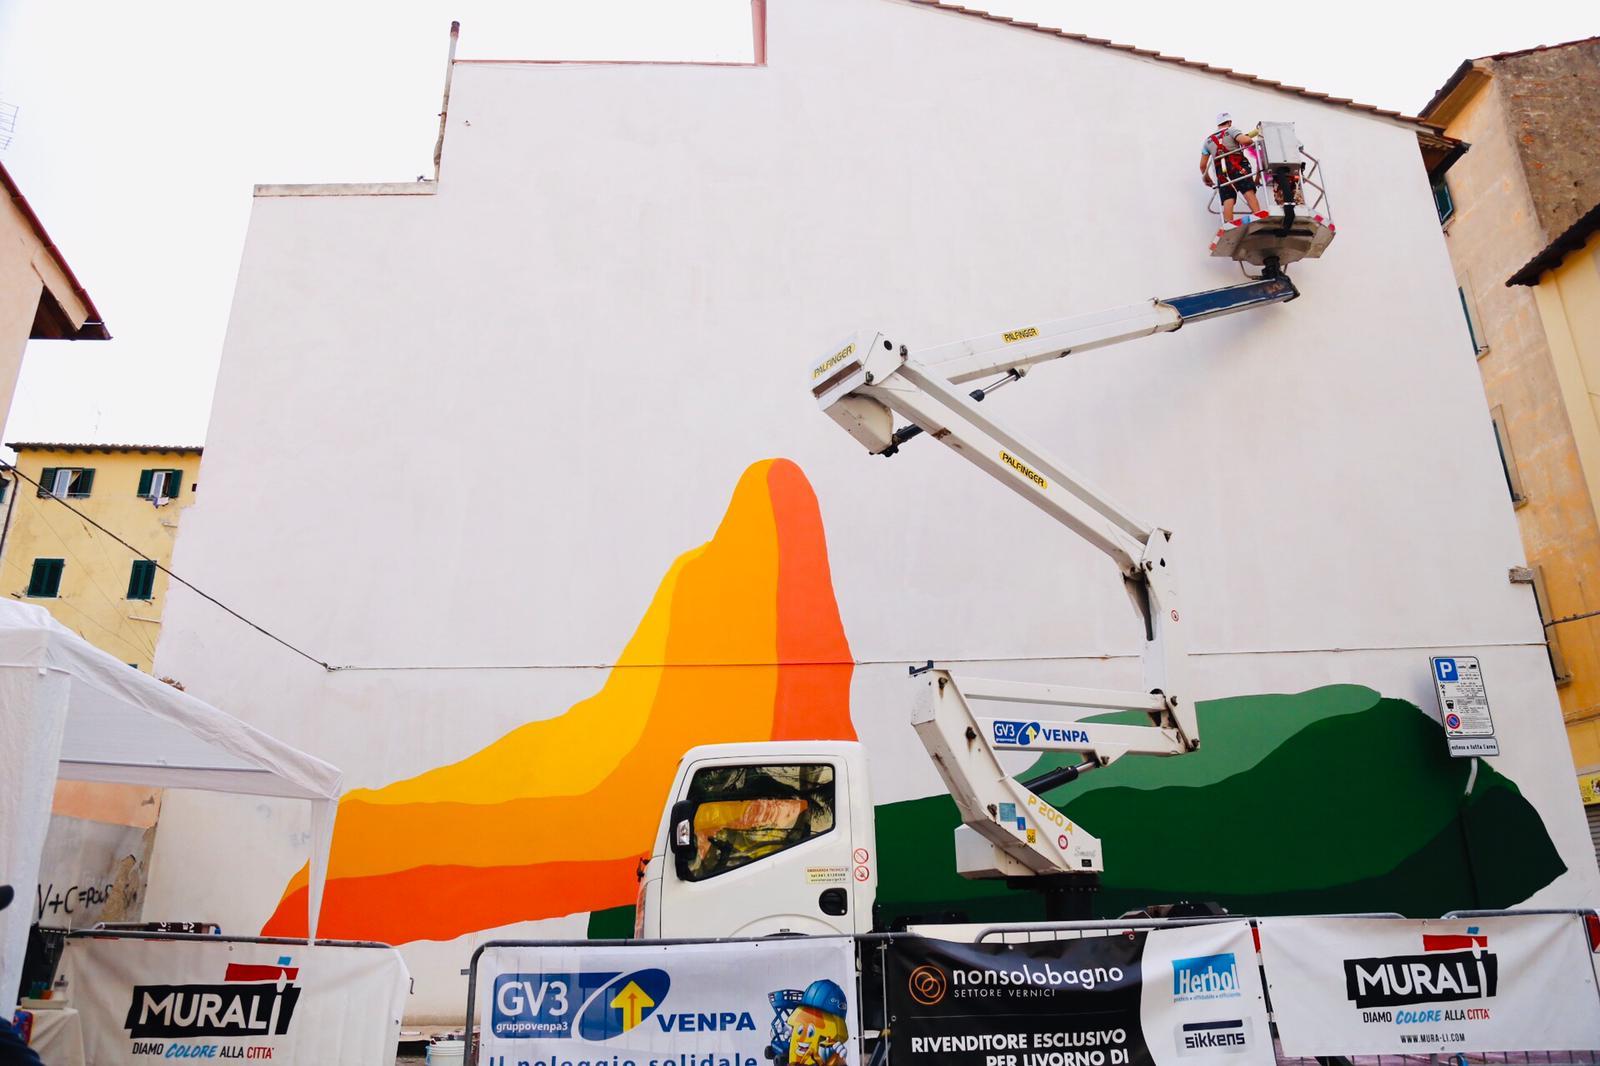 08.2020 #fullcolor - Moneyless I MURALI I Livorno 1